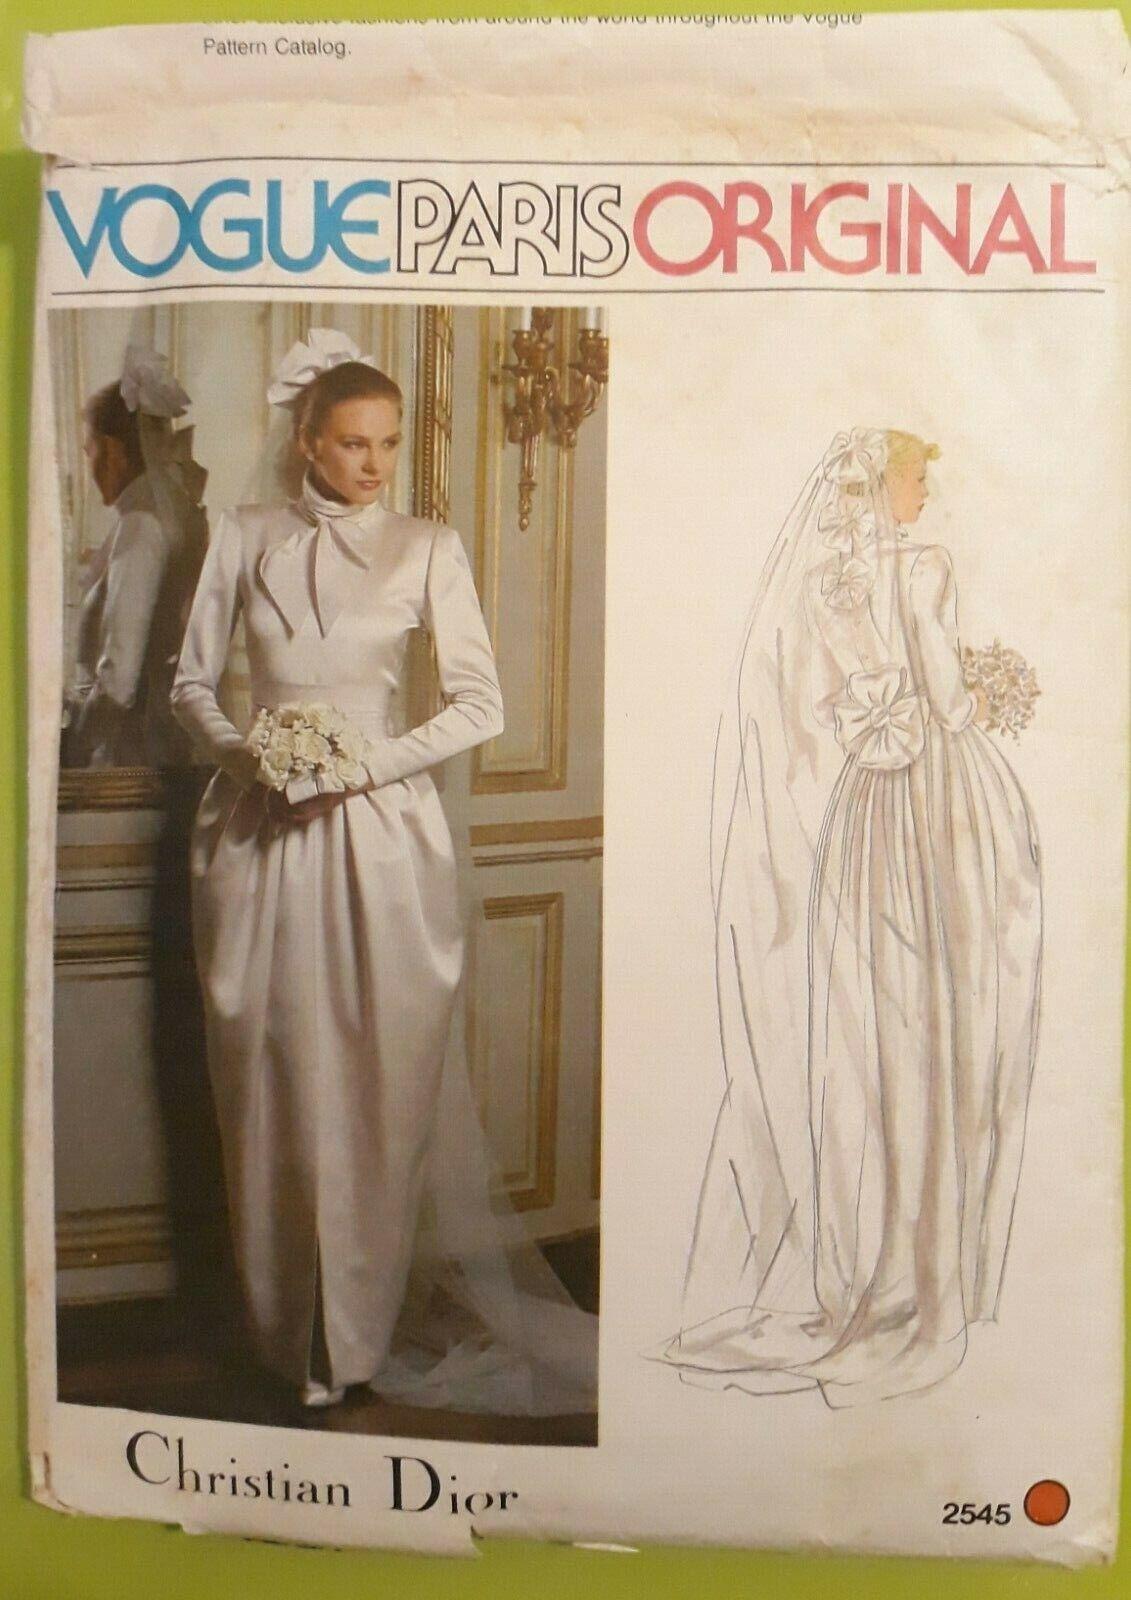 Vogue paris original, patron robe de mariée christian dior, t.12